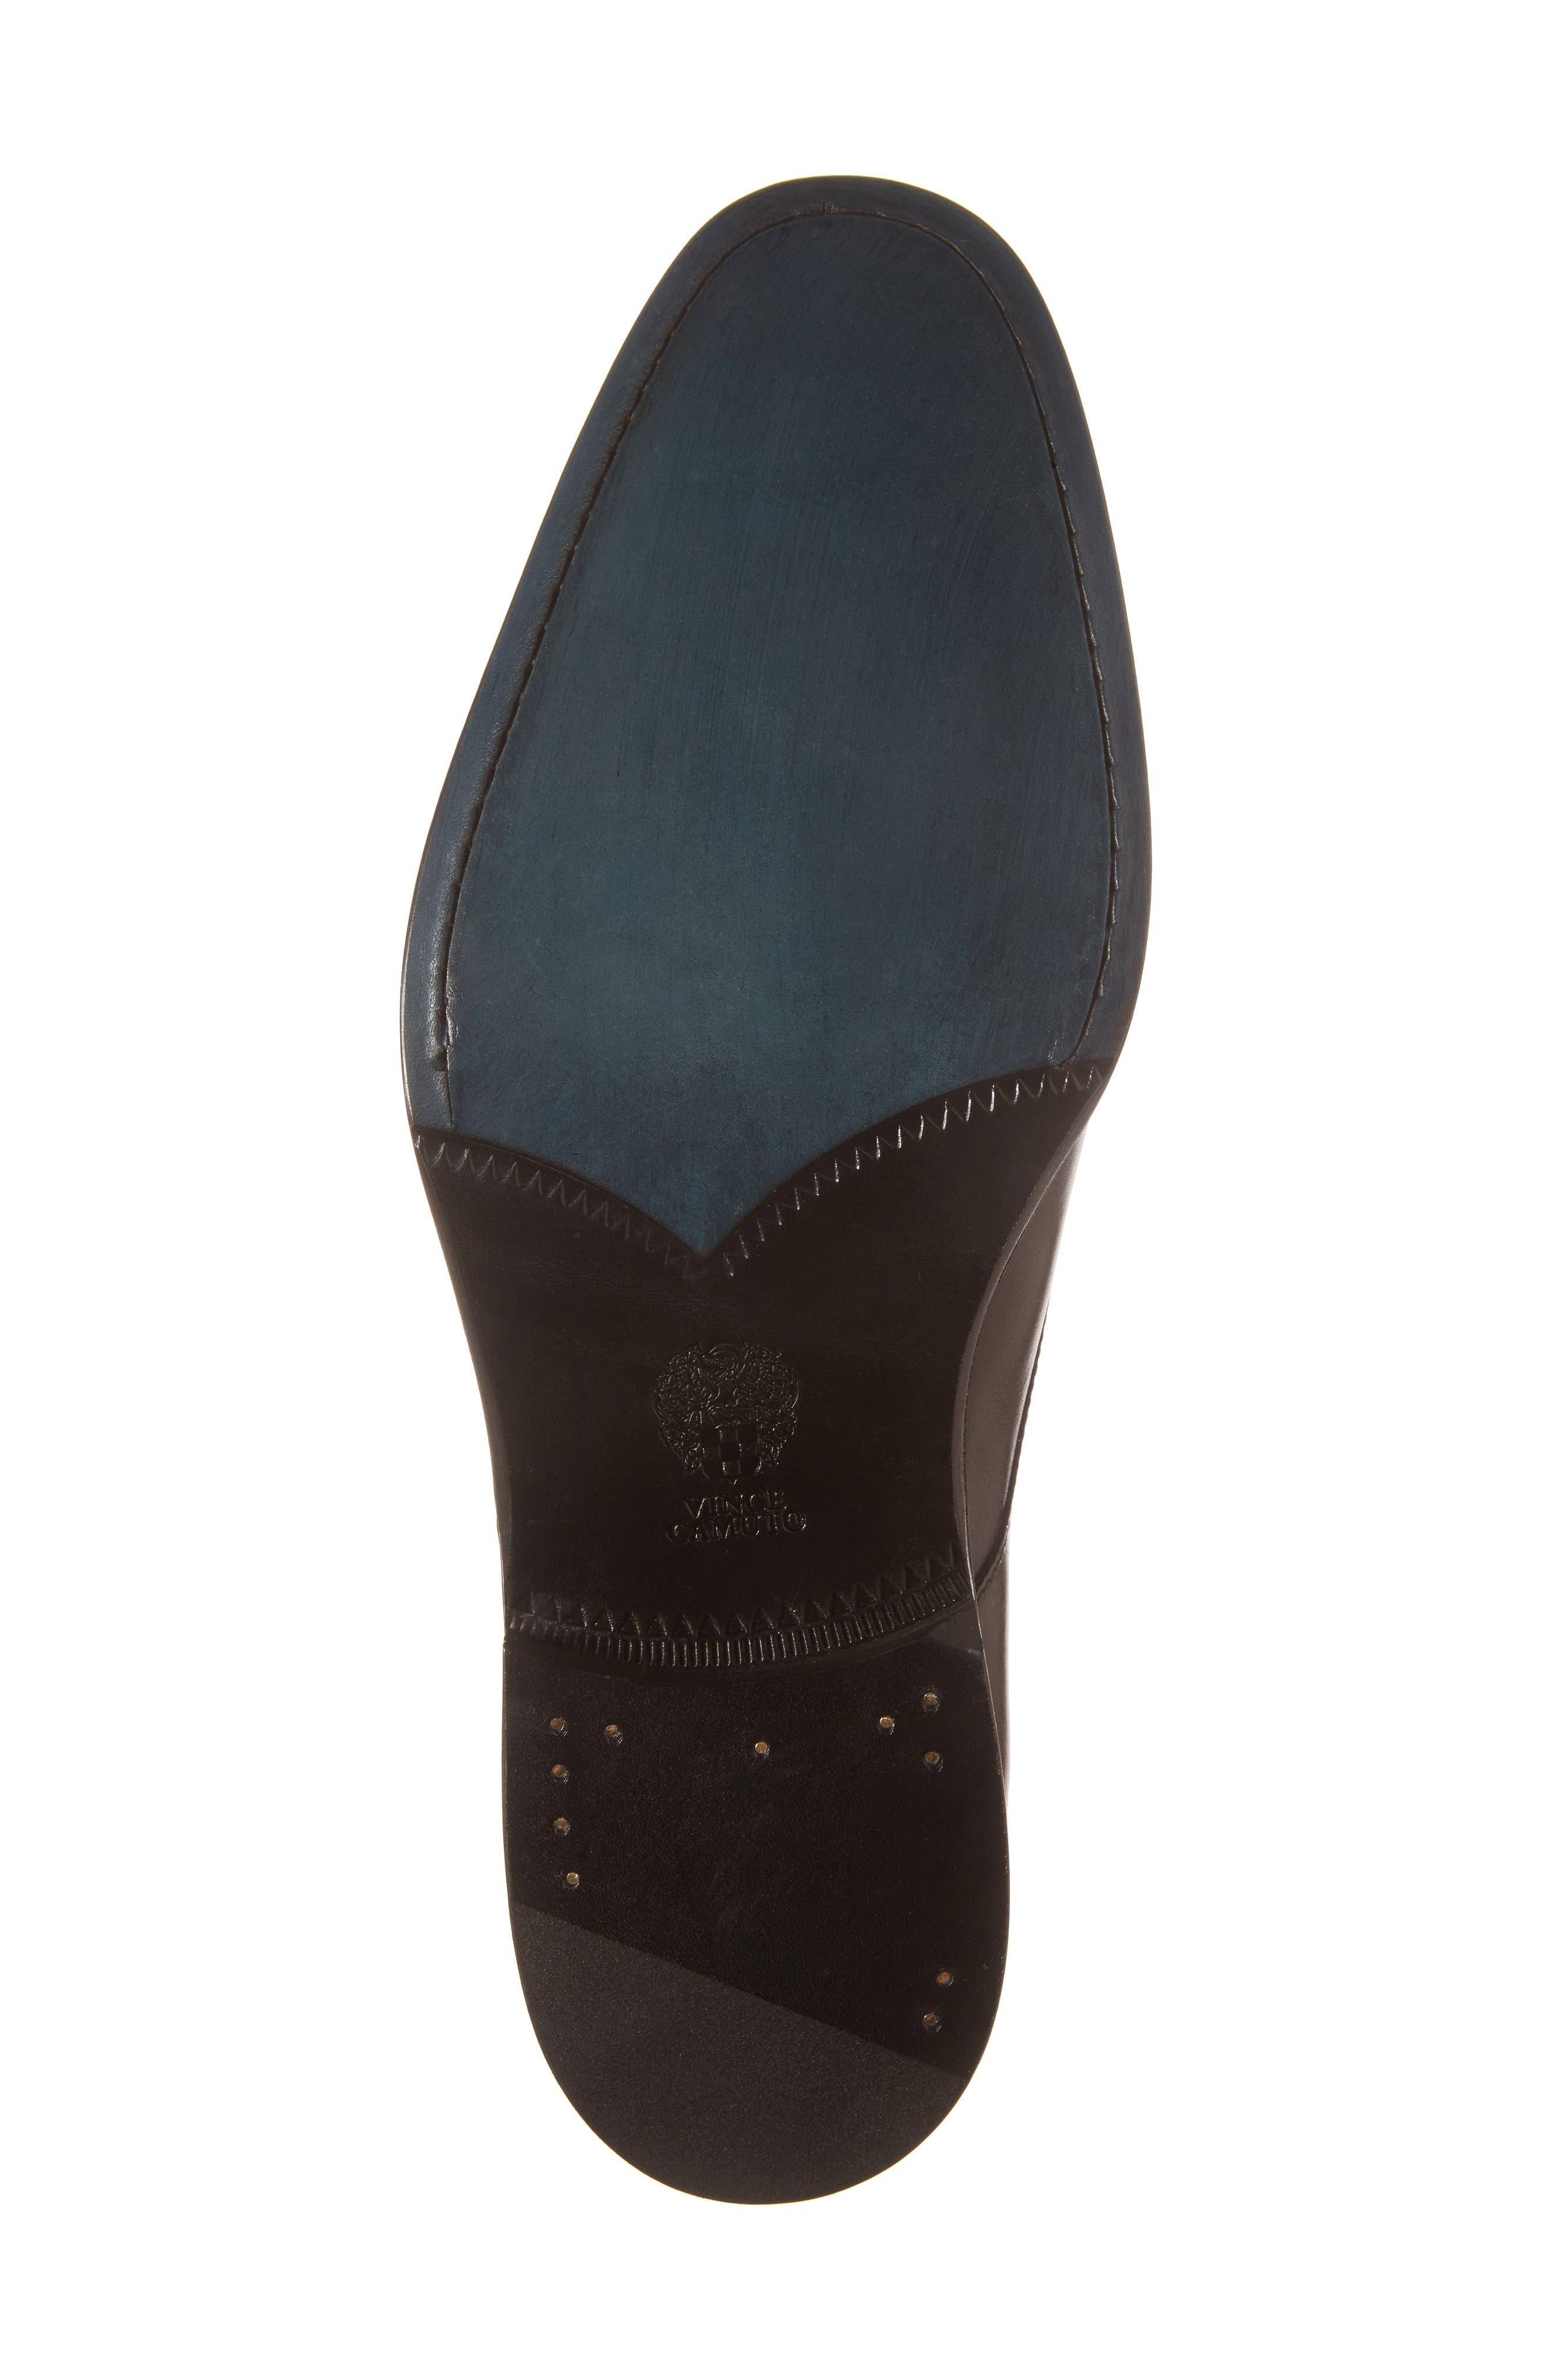 Haltter Medallion Toe Derby,                             Alternate thumbnail 6, color,                             Dark Brown Leather